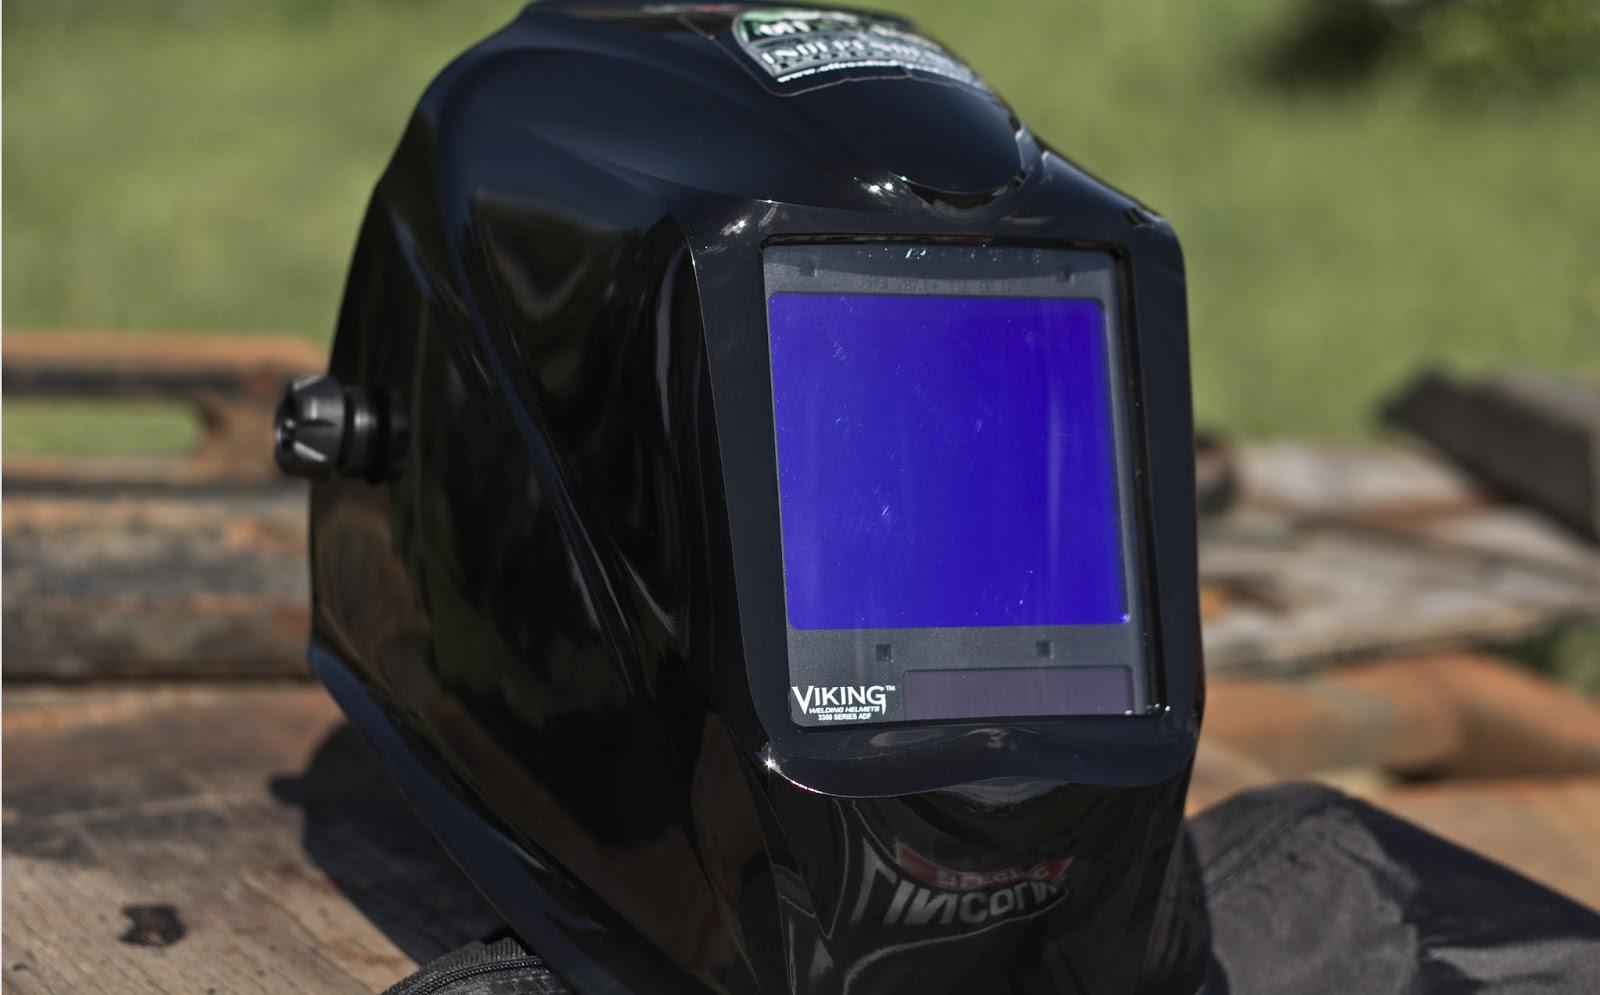 viking orig black diamond lincoln helmet tool vikingtrade electric welding le product